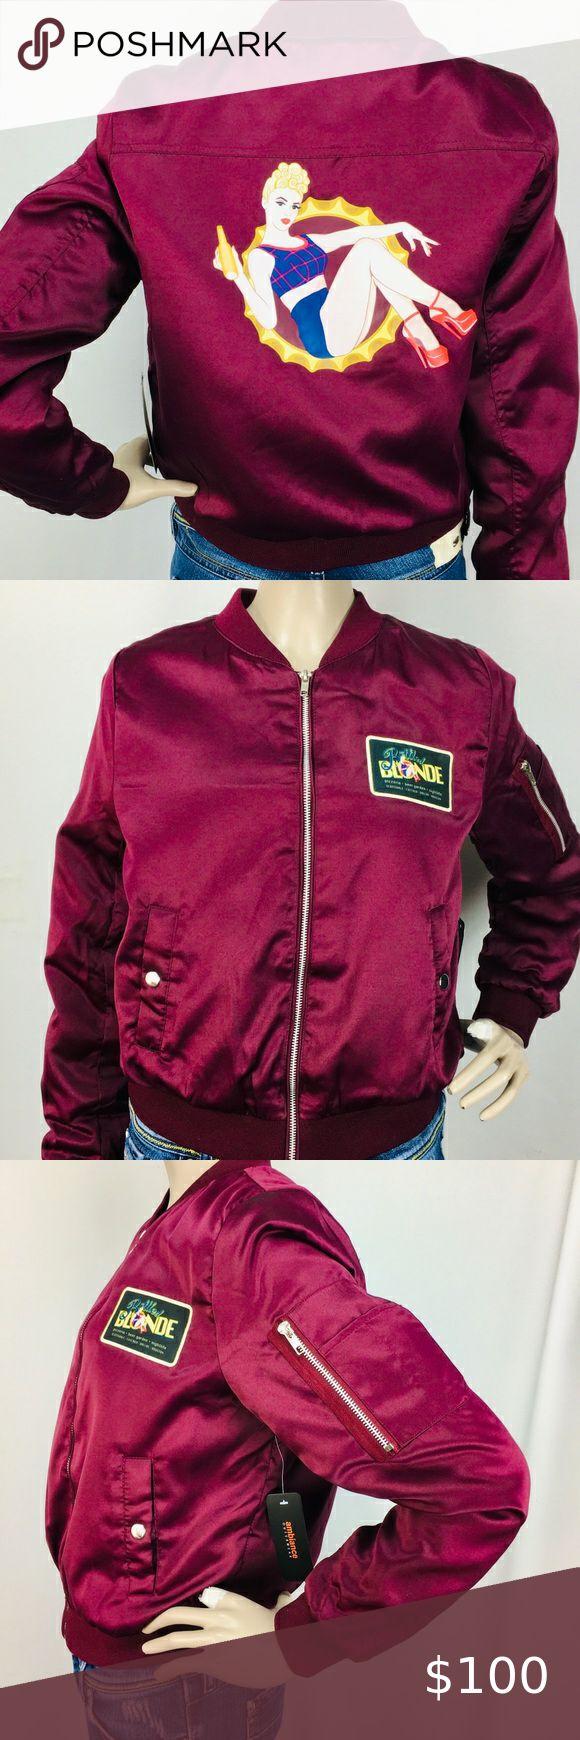 Burgundy Retro Pinup Bomber Jacket Bottled Blonde In 2021 Outerwear Women Clothes Design Bomber Jacket [ 1740 x 580 Pixel ]